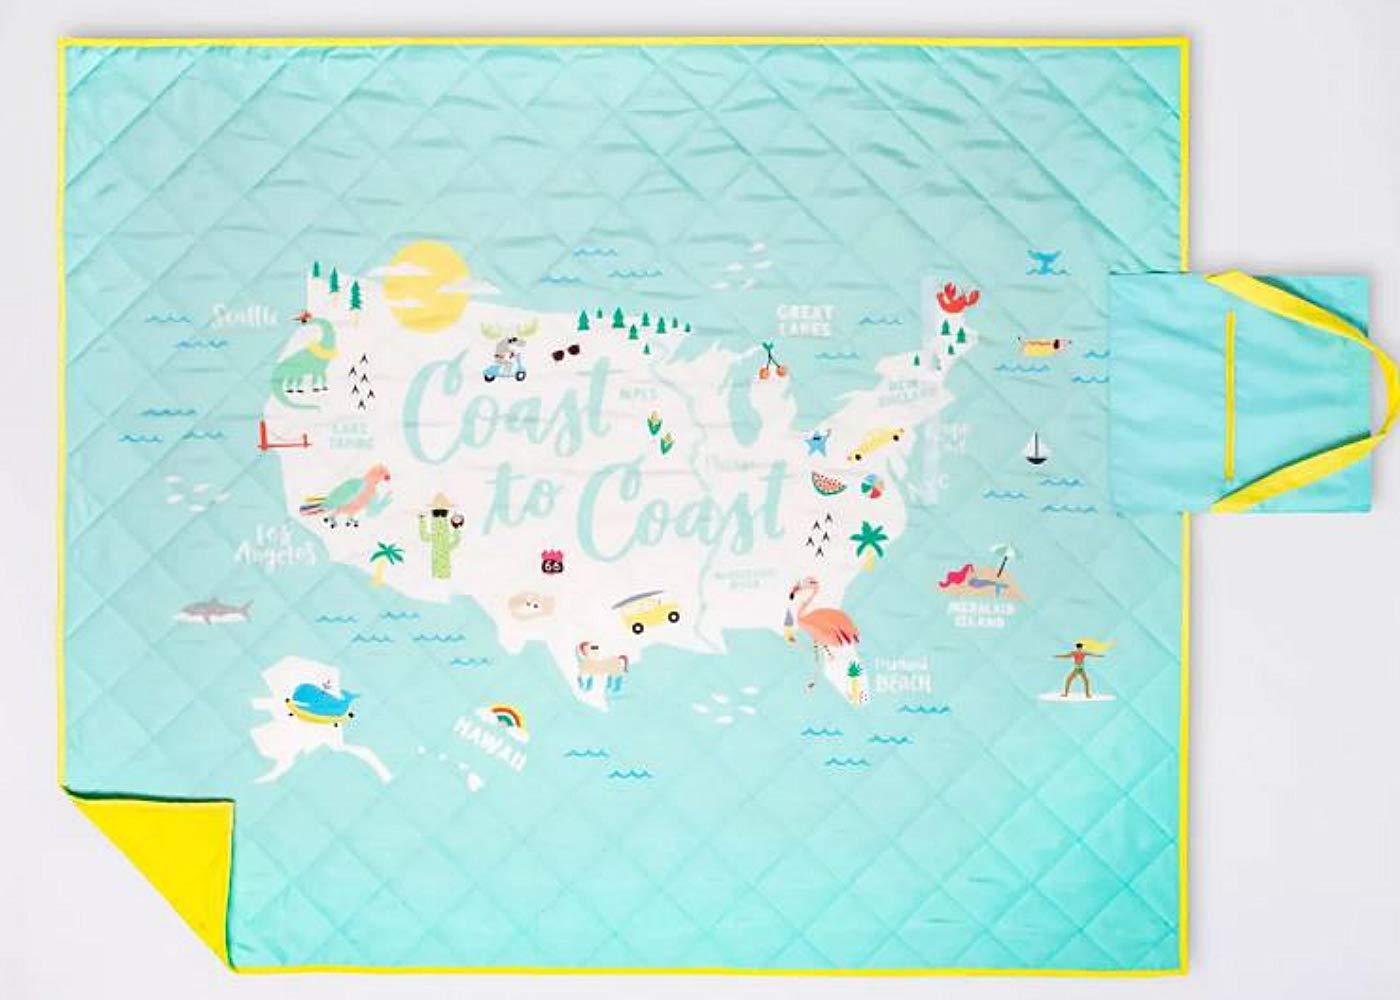 Sun Squad Coast to Coast Picnic Blanket, 60''x72'' by Sun Squad